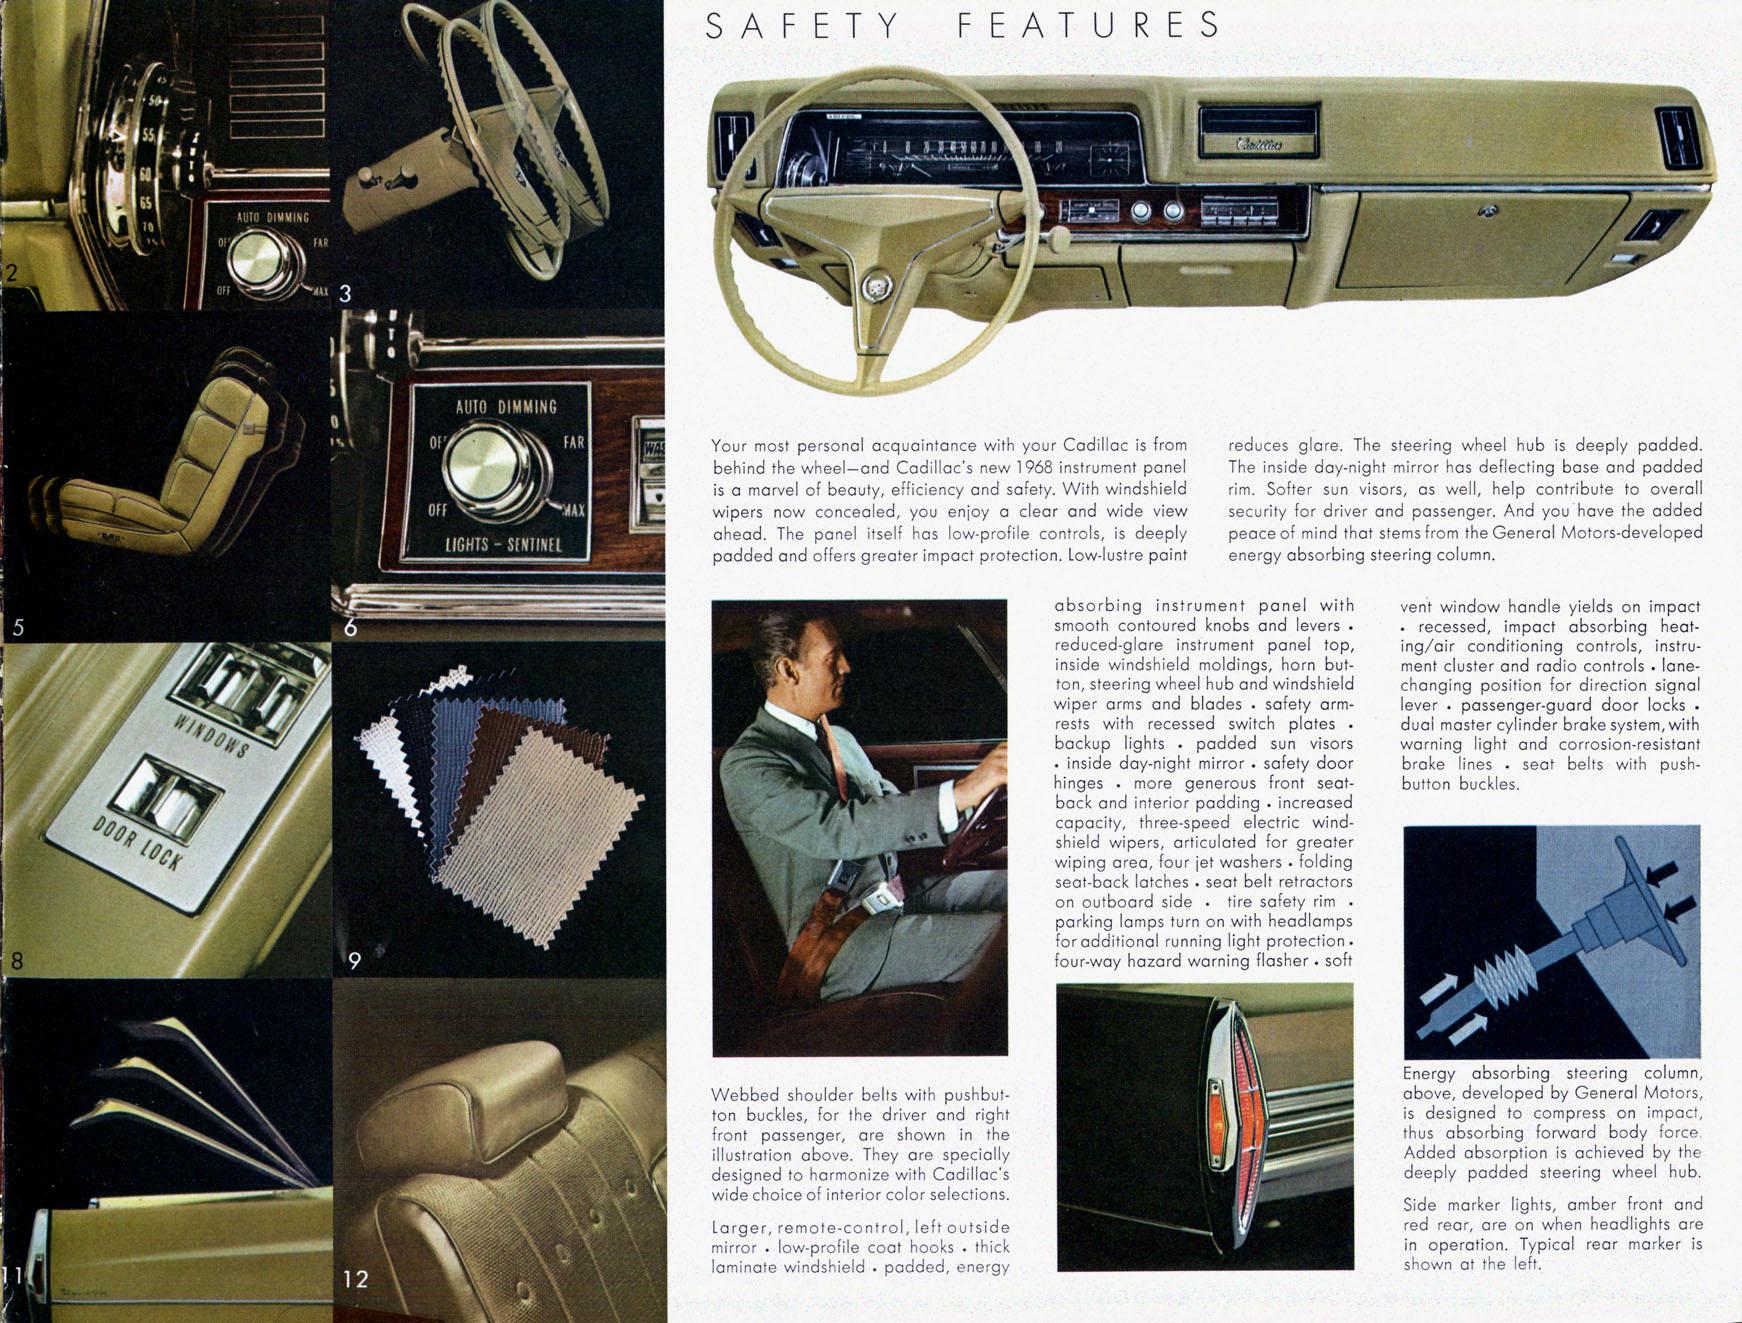 TunnelRam_Cadillac (25).jpg